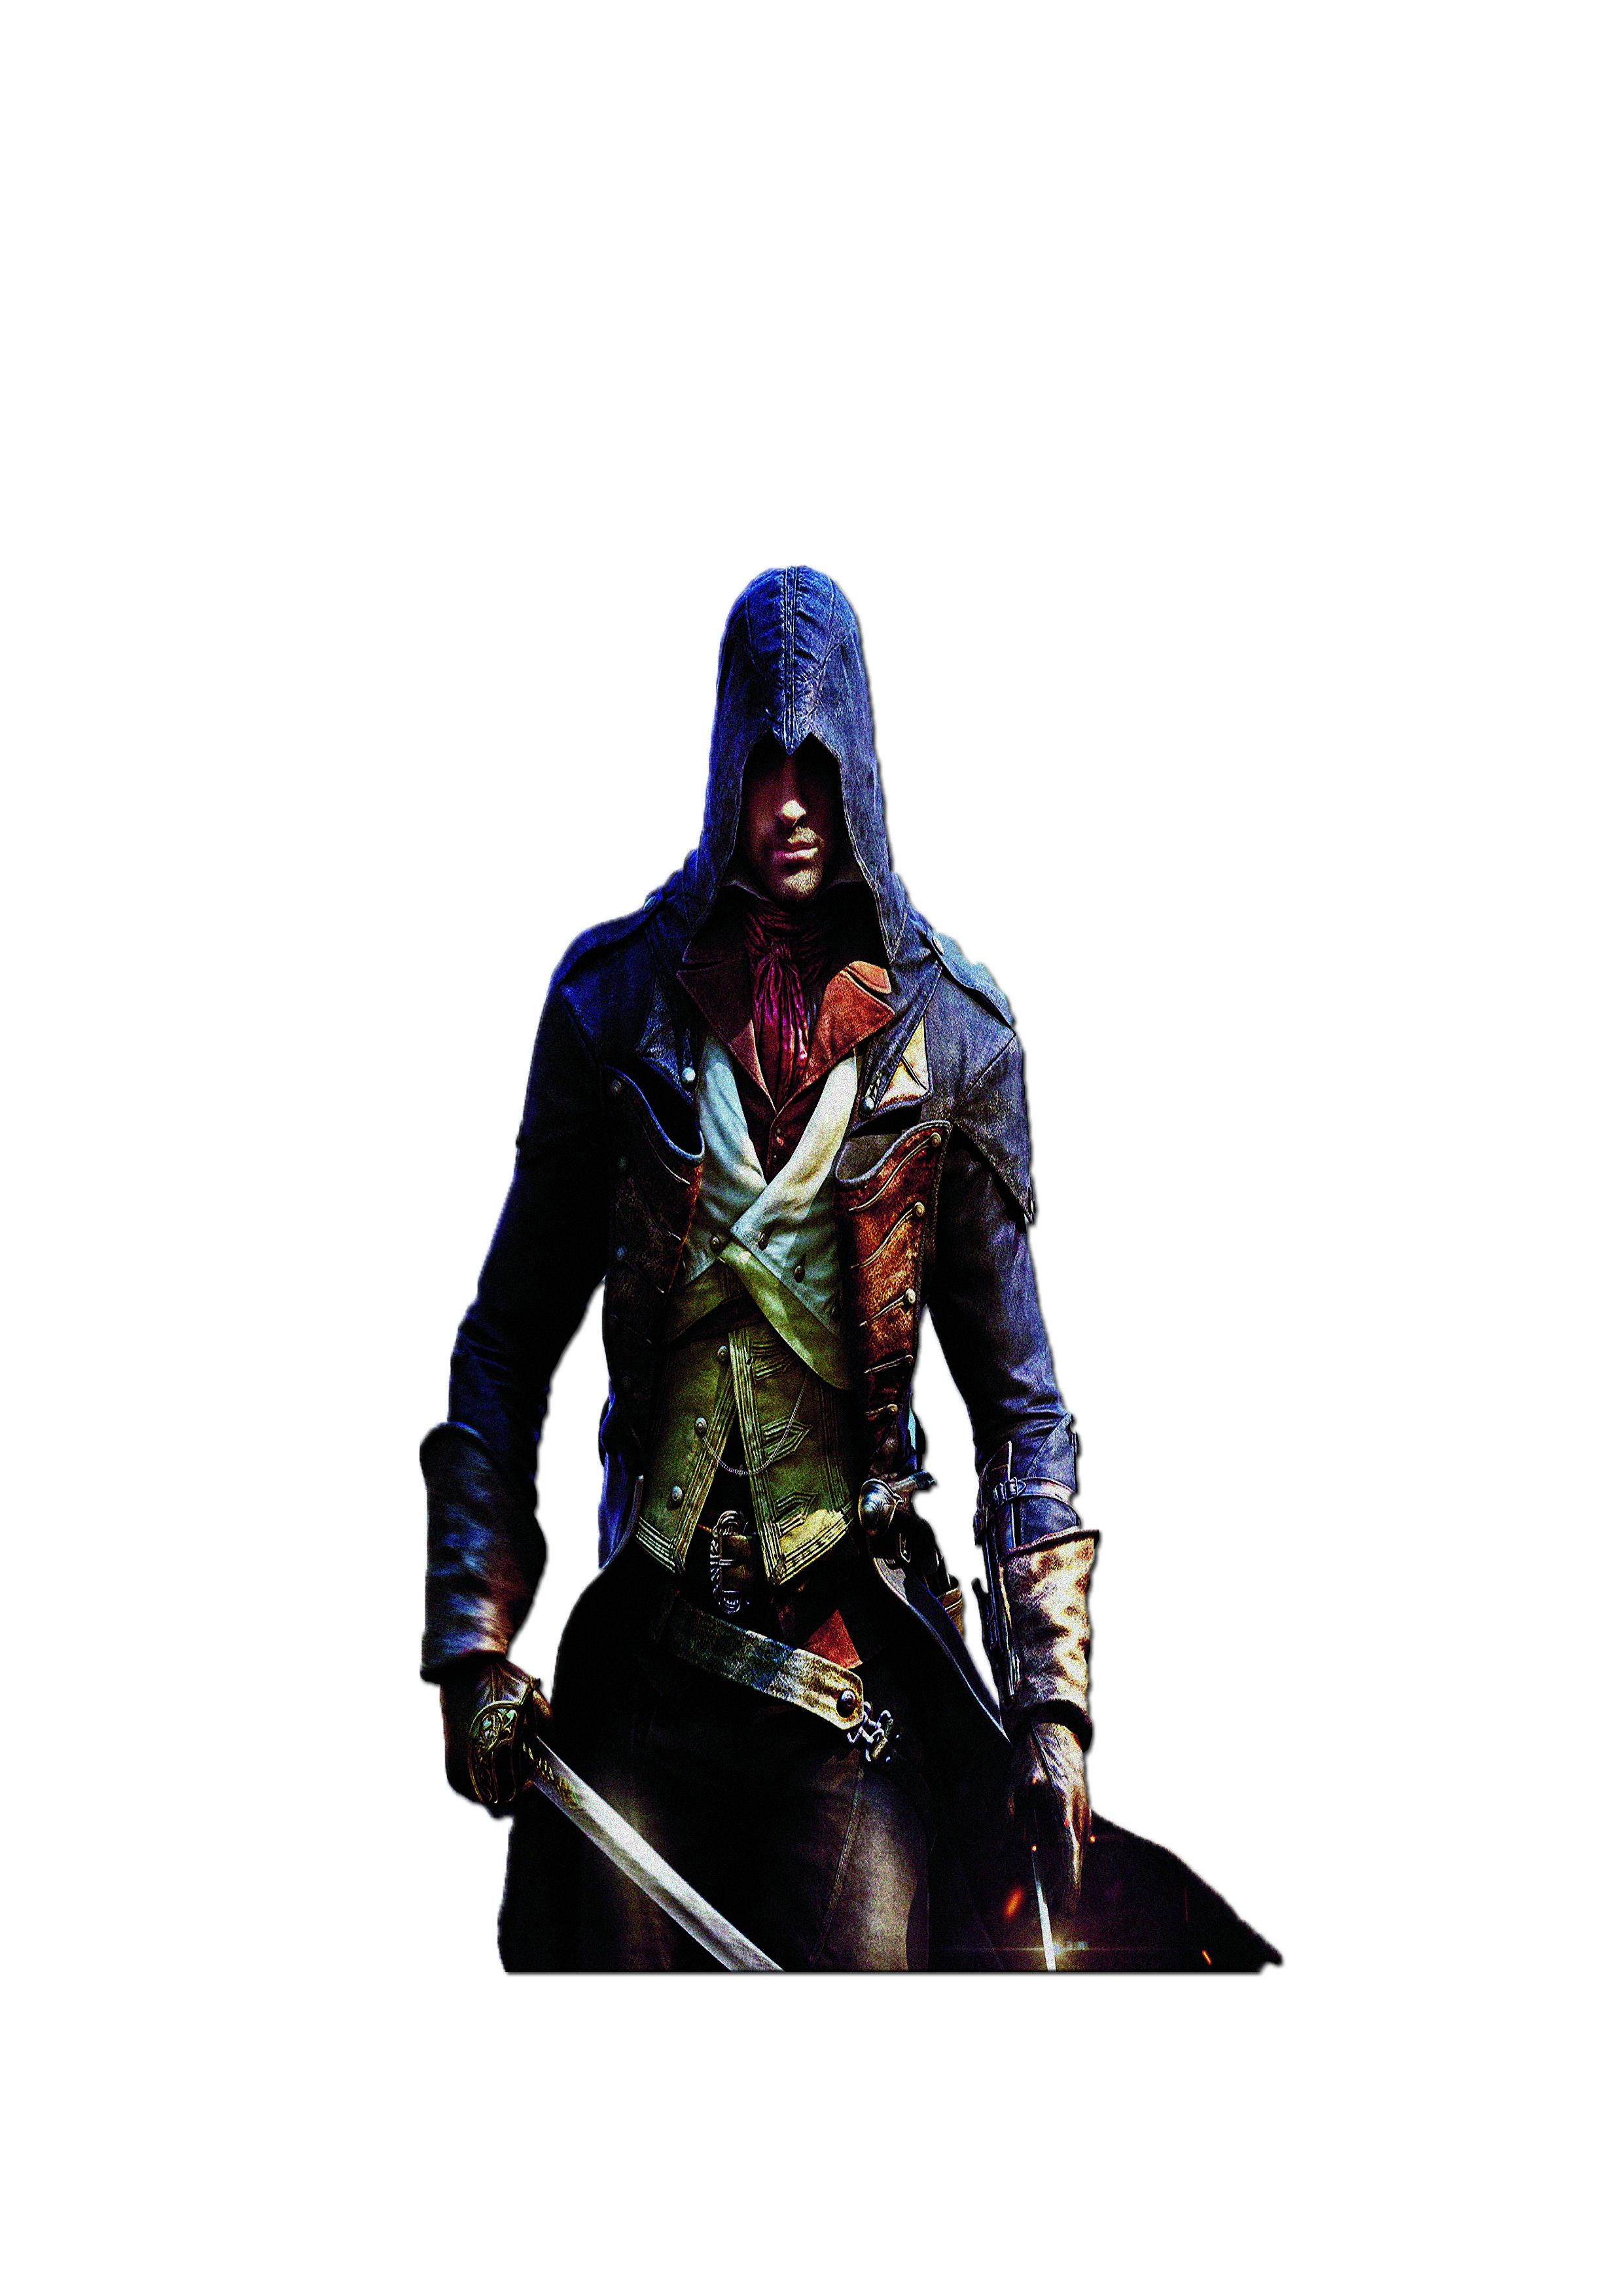 Assassins Creed/Source:Photoshop/Dimensions 2480×3508/Color Mode CMYK